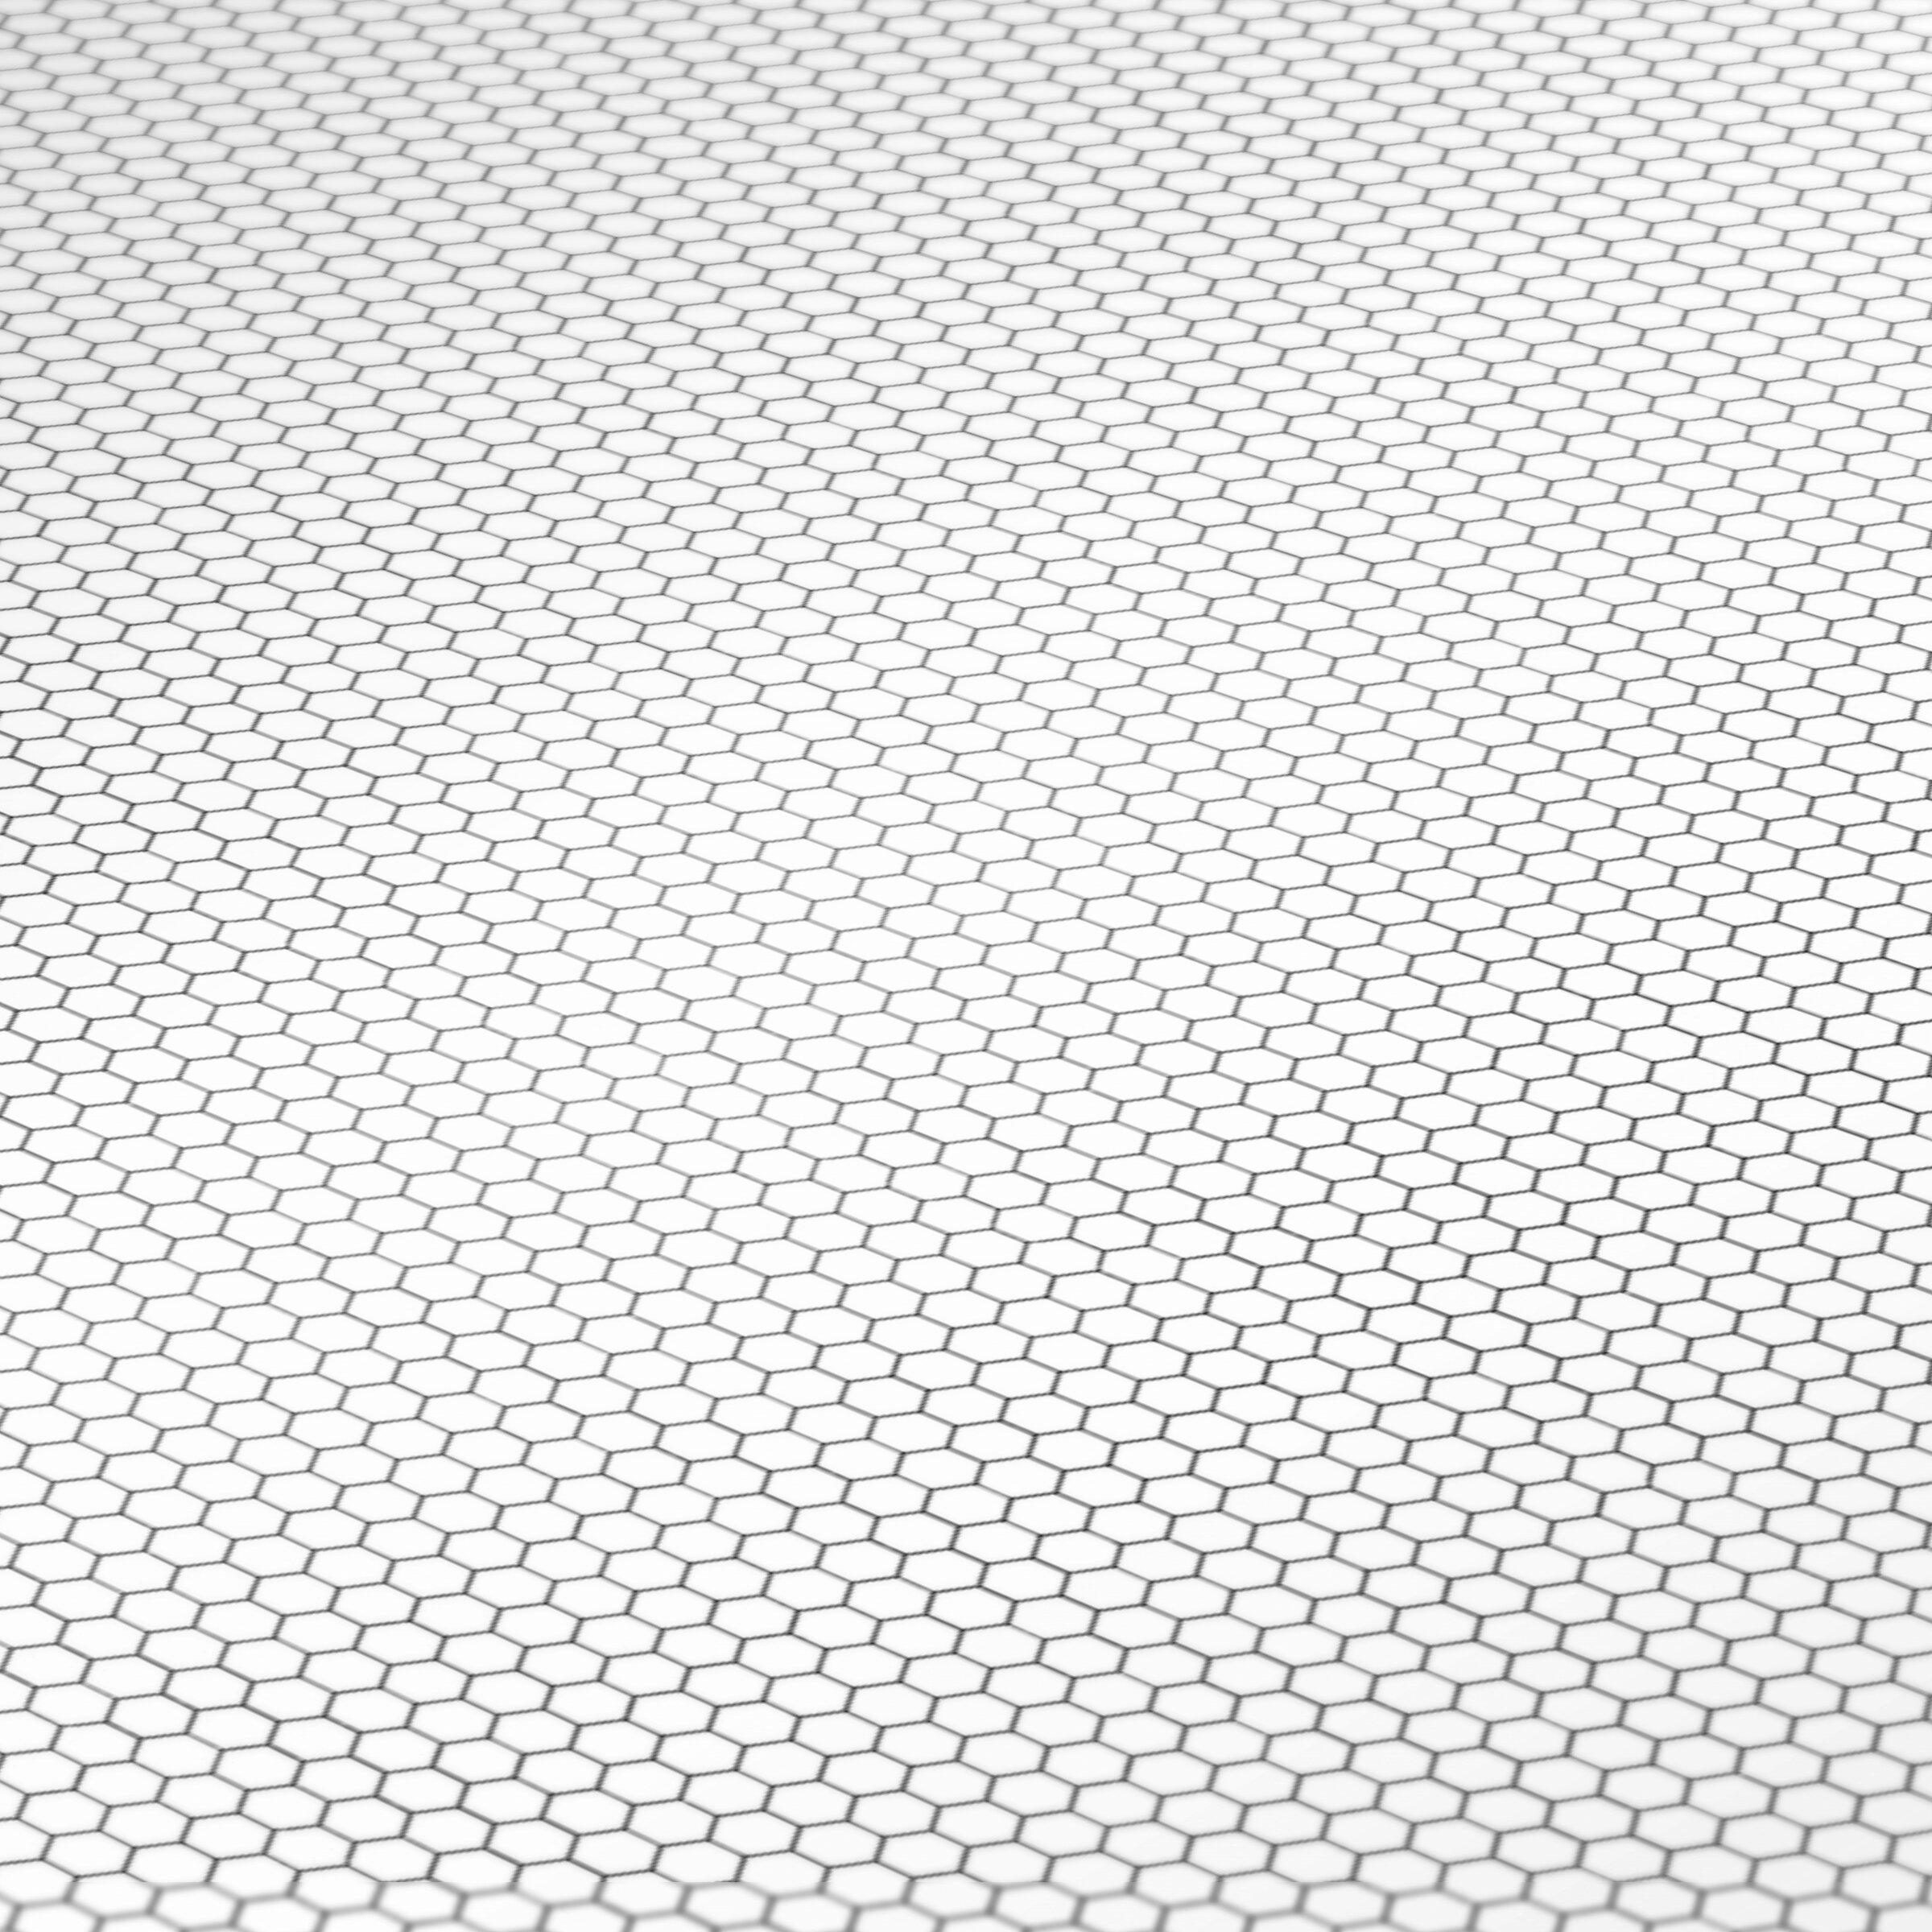 image regarding Hex Paper Printable identified as White Hex Mosaic Tile Printable Jessica Cloe Miniatures